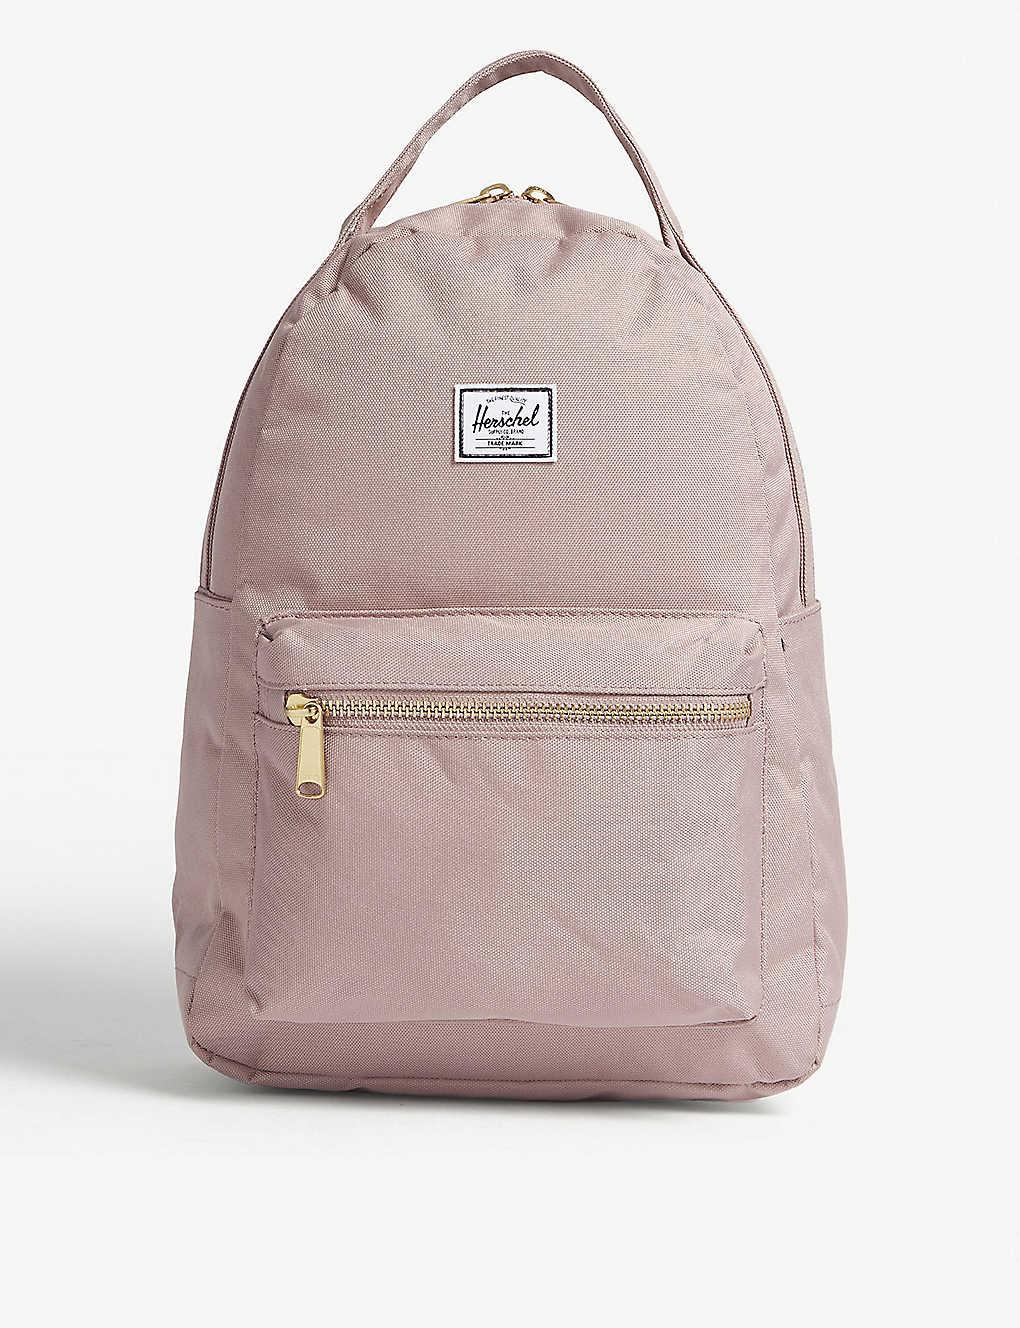 cc9714c93 HERSCHEL SUPPLY CO - Nova mini backpack   Selfridges.com